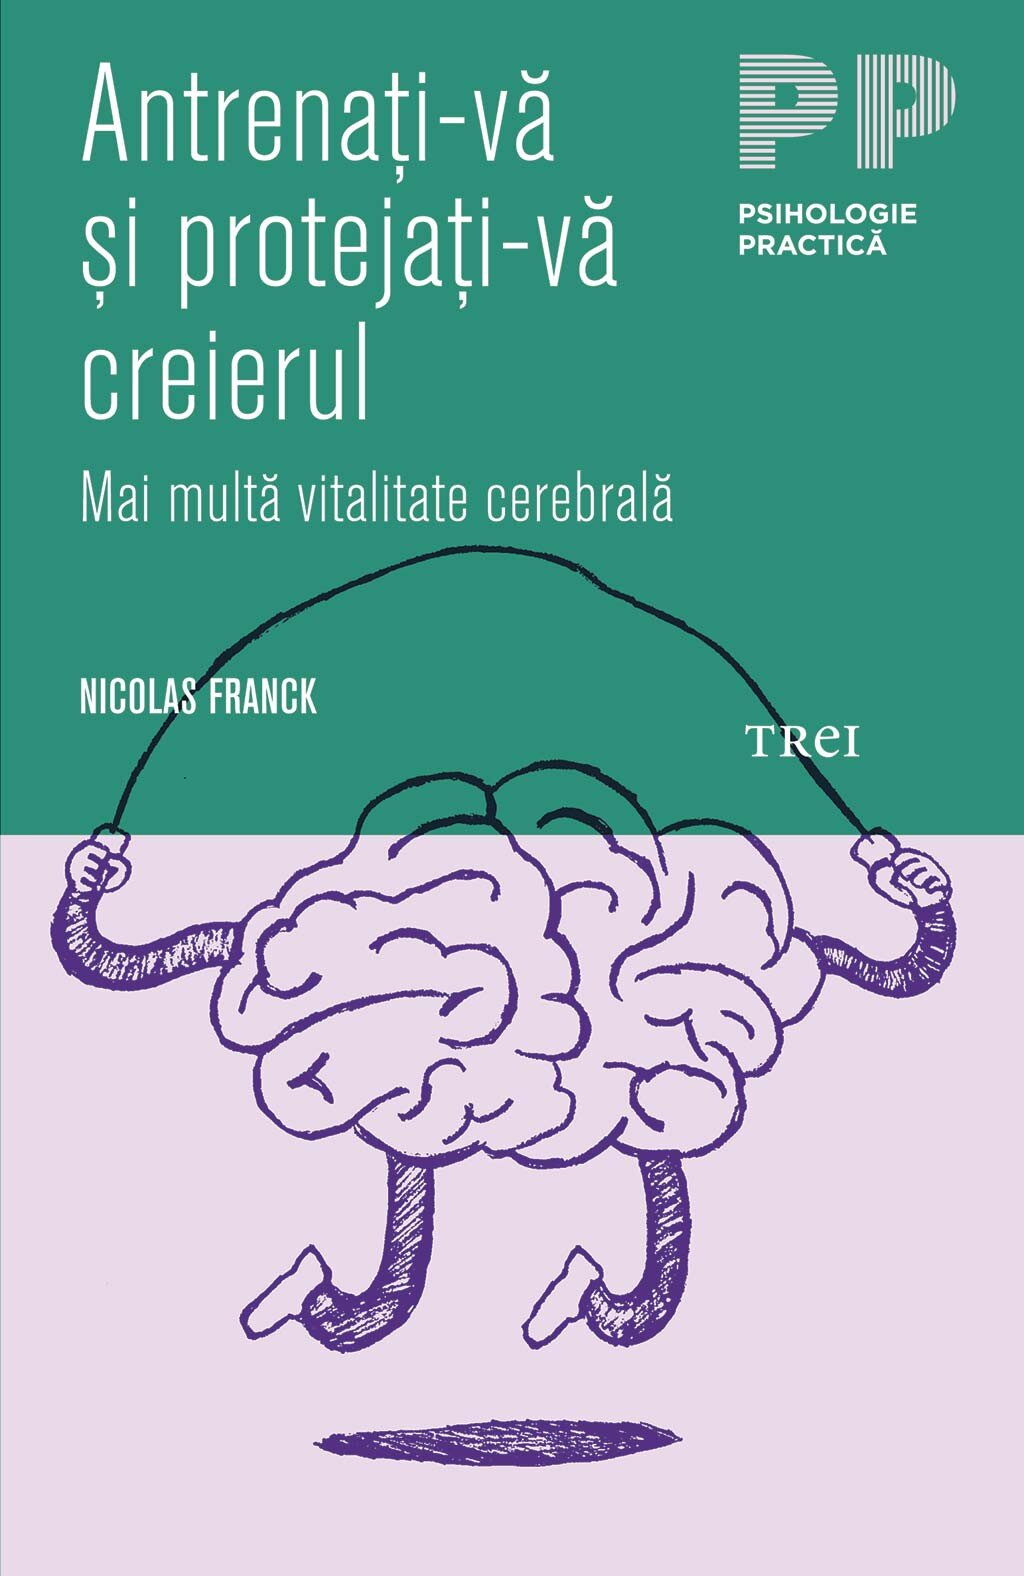 Antrenati-va si protejati-va creierul. Mai multa vitalitate cerebrala (eBook)